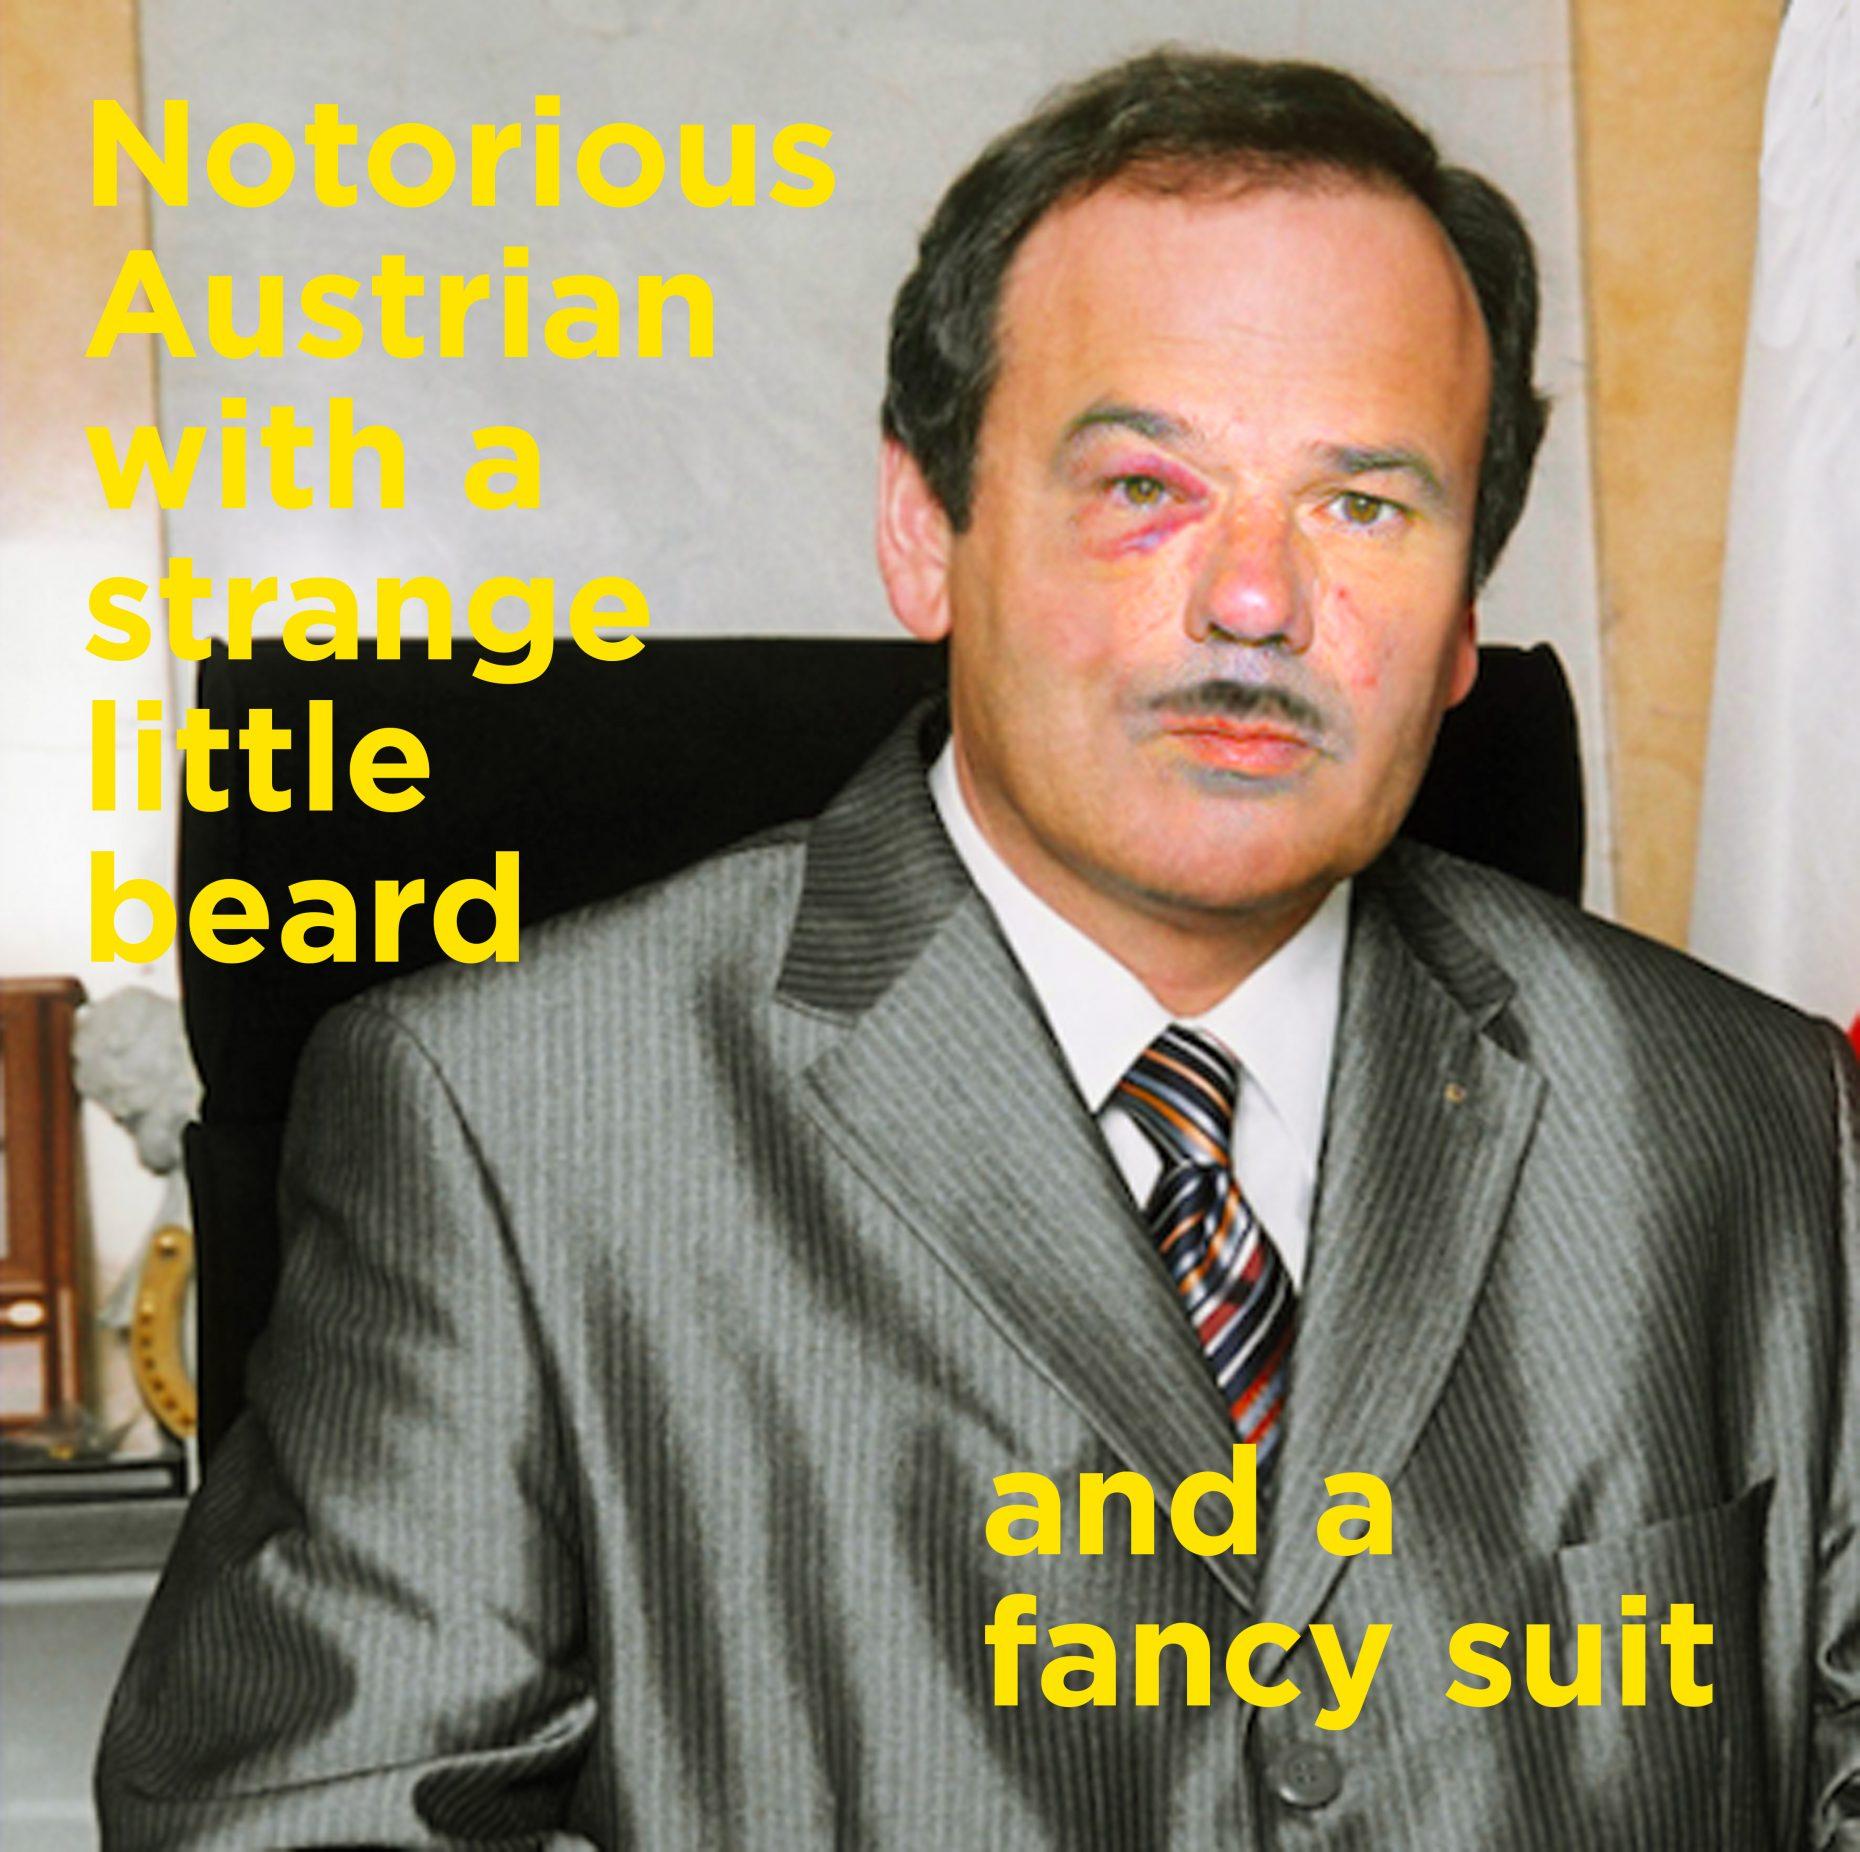 Notorious Austrian with a strange little beard